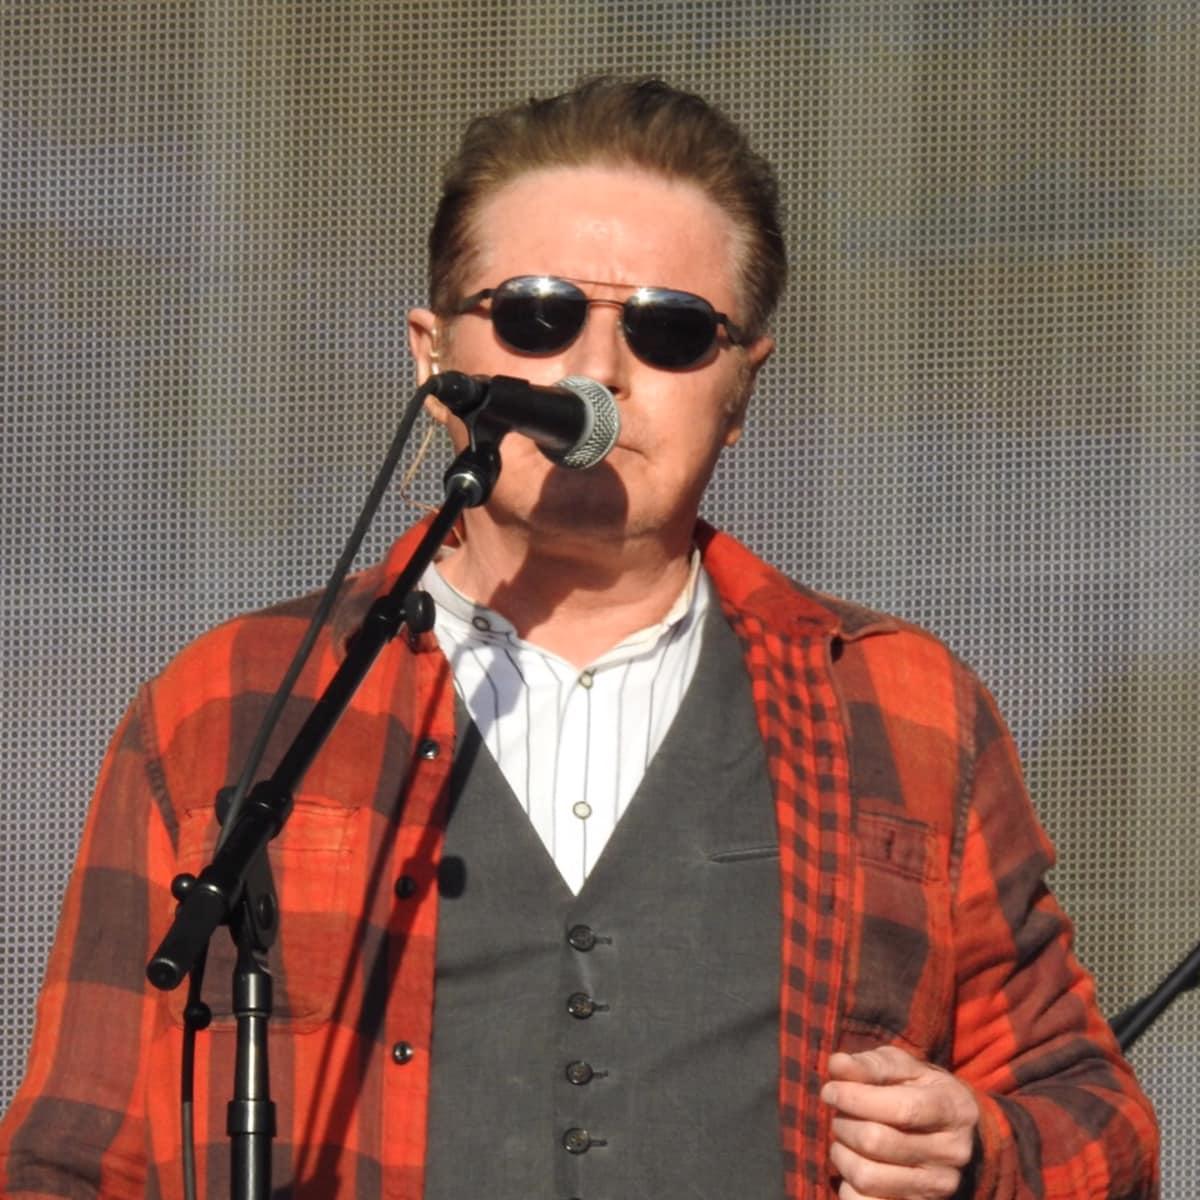 Don Henley at London concert